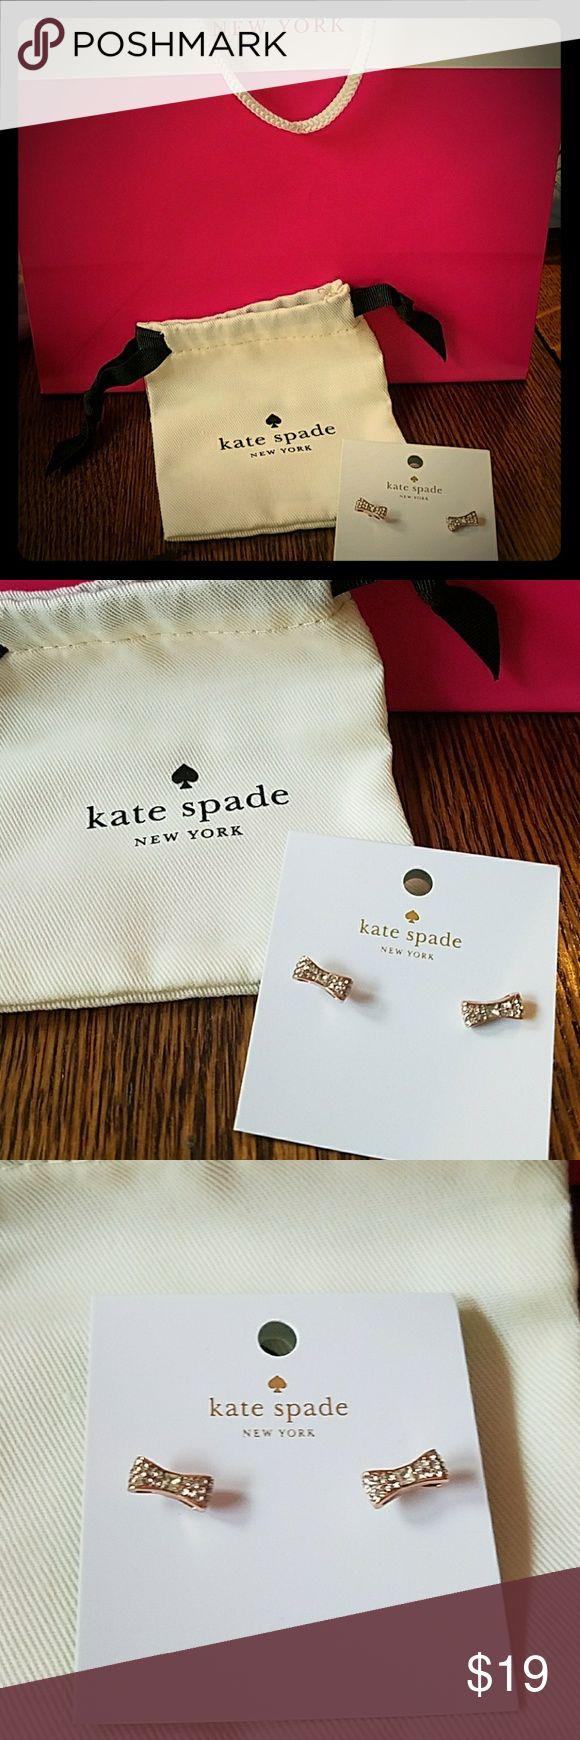 Kate Spade Stud Earrings Ready set Bow Kate Spade Stud Earrings Clear stones- rose gold  NWT kate spade Jewelry Earrings